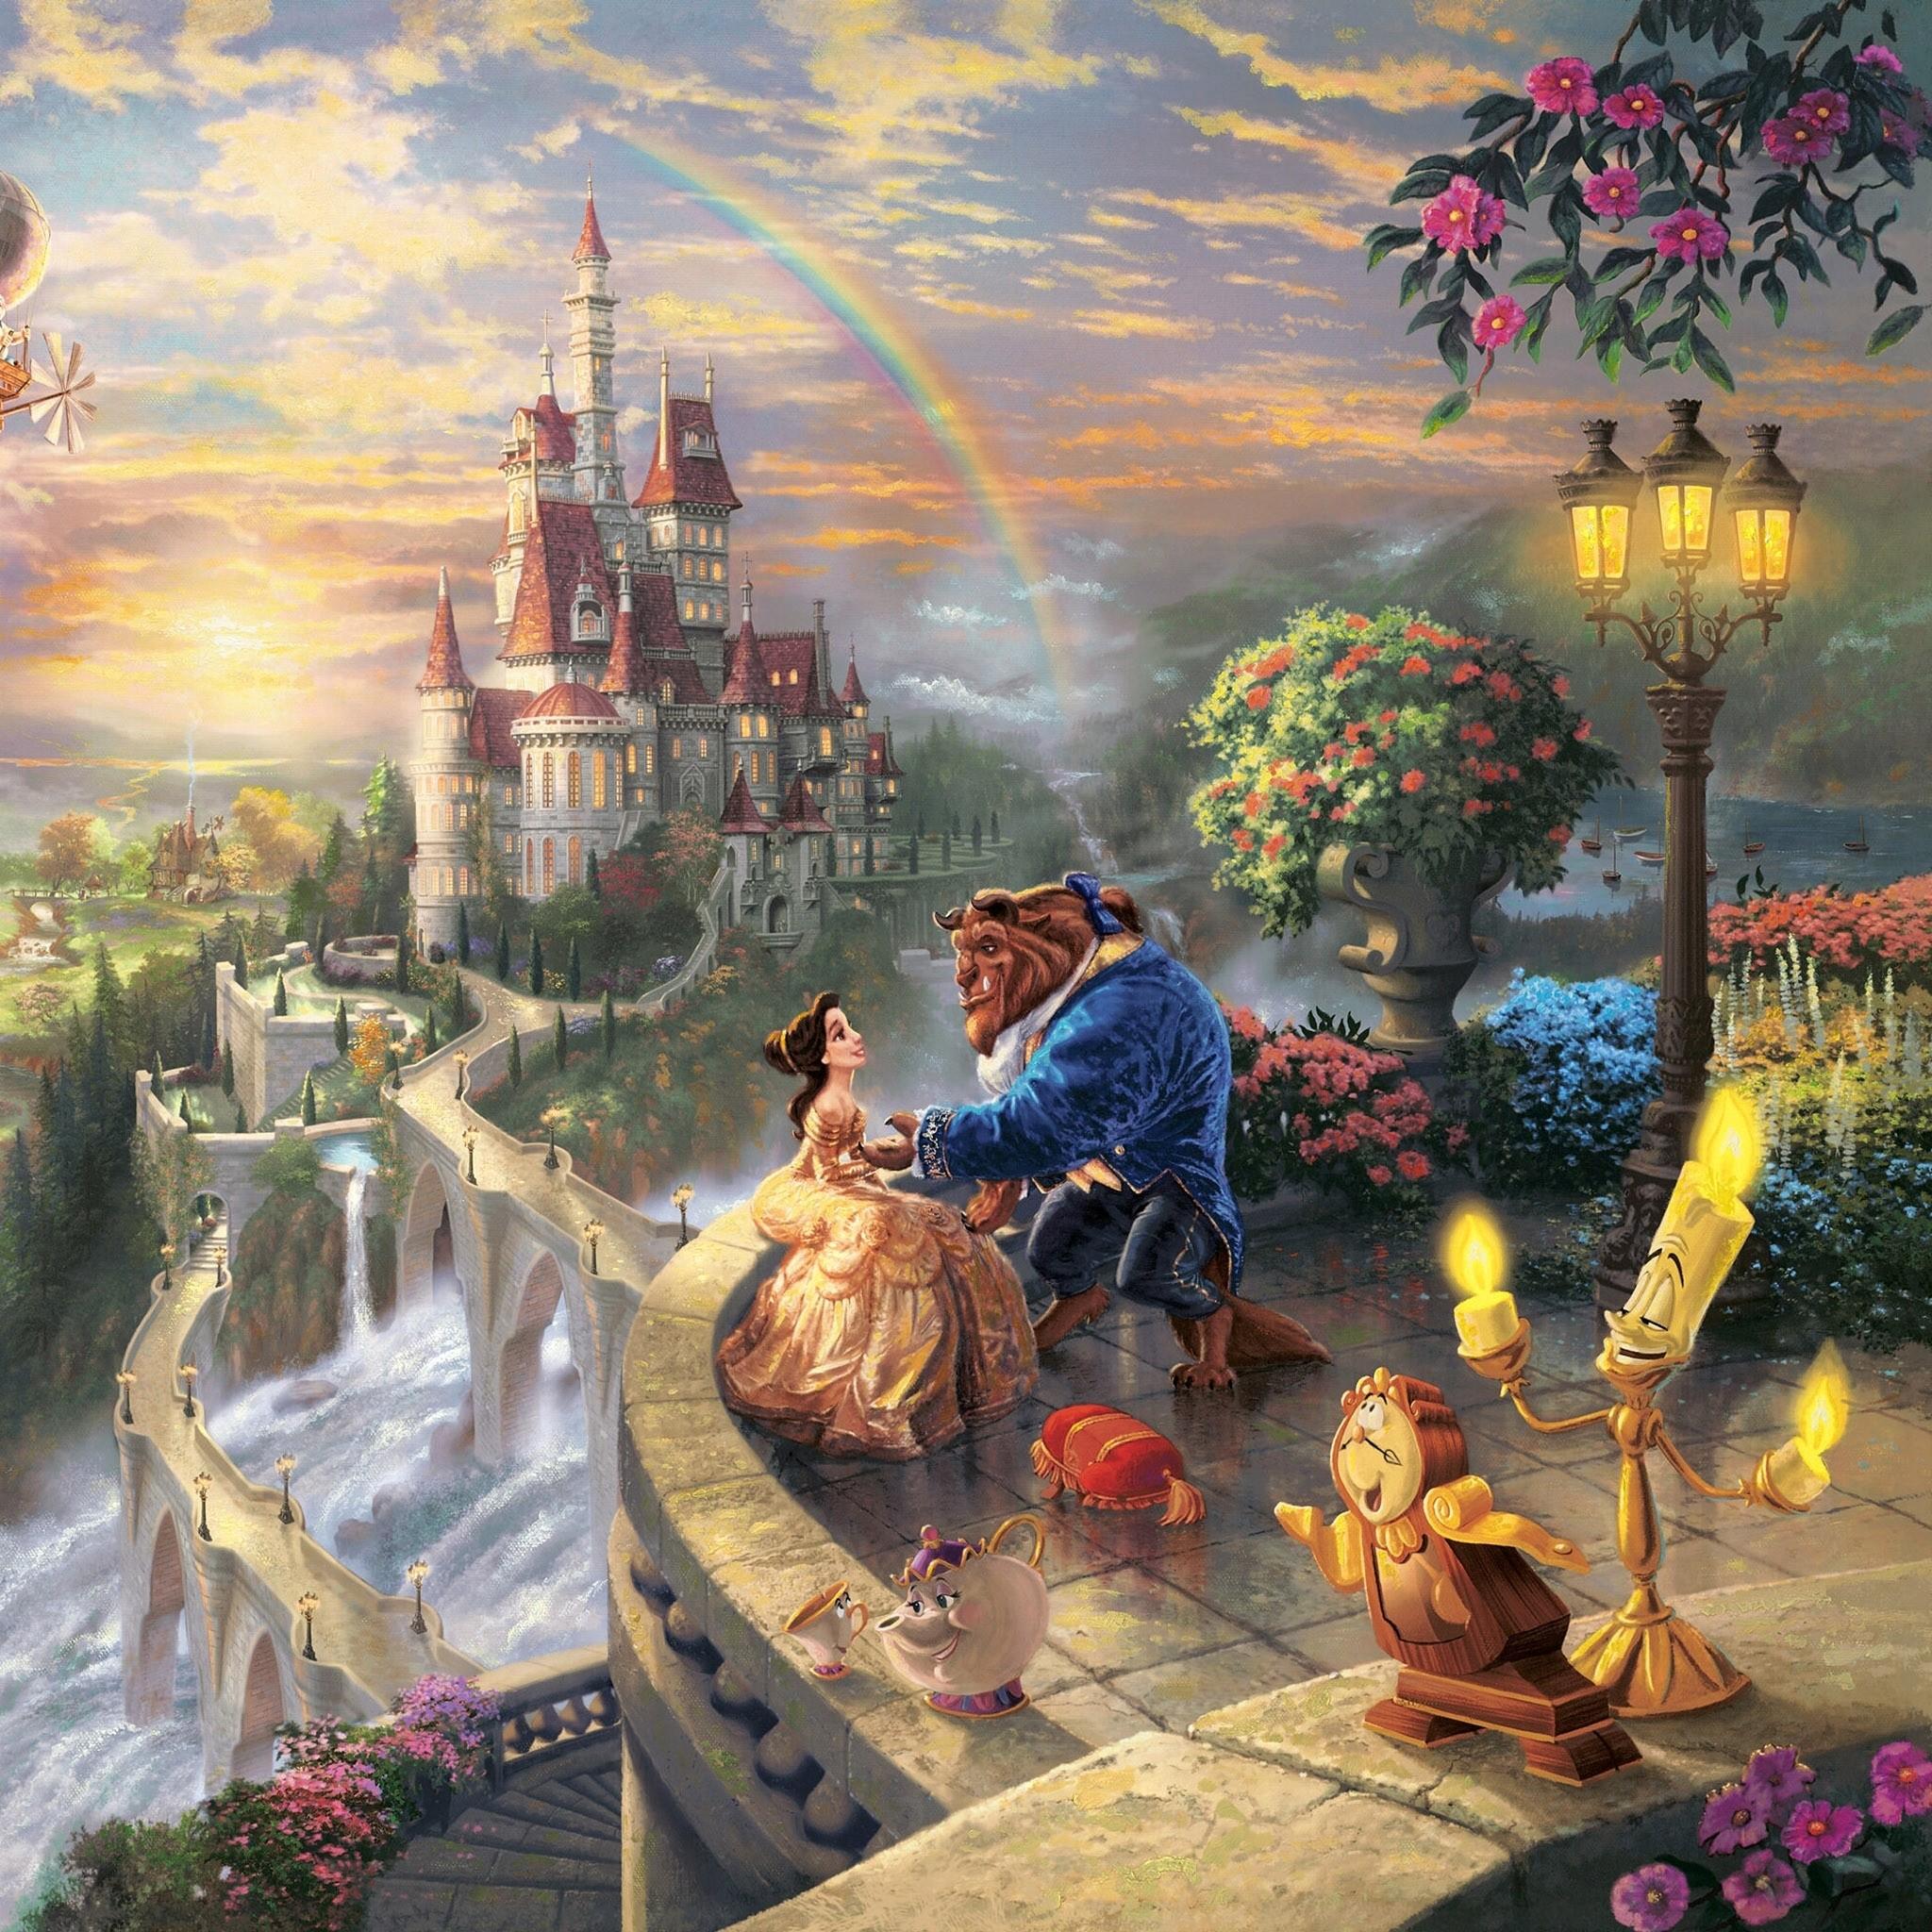 Thomas Kinkade Beauty and the Beast